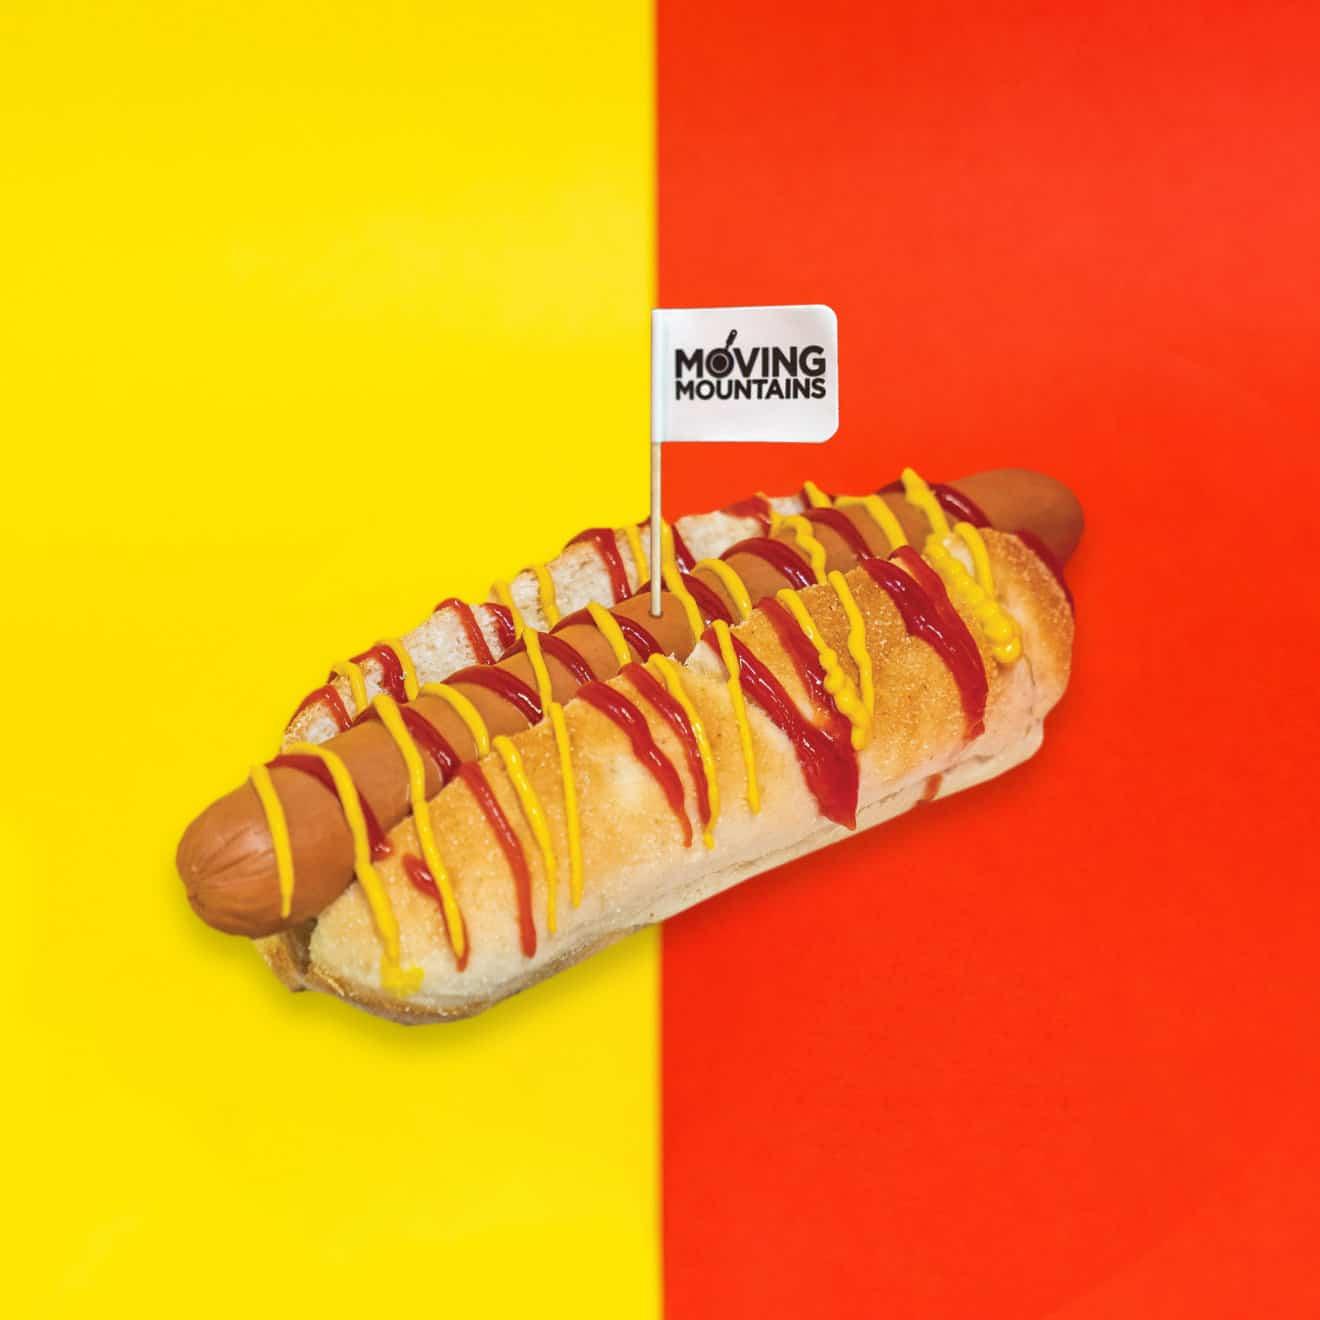 moving mountains hot dog